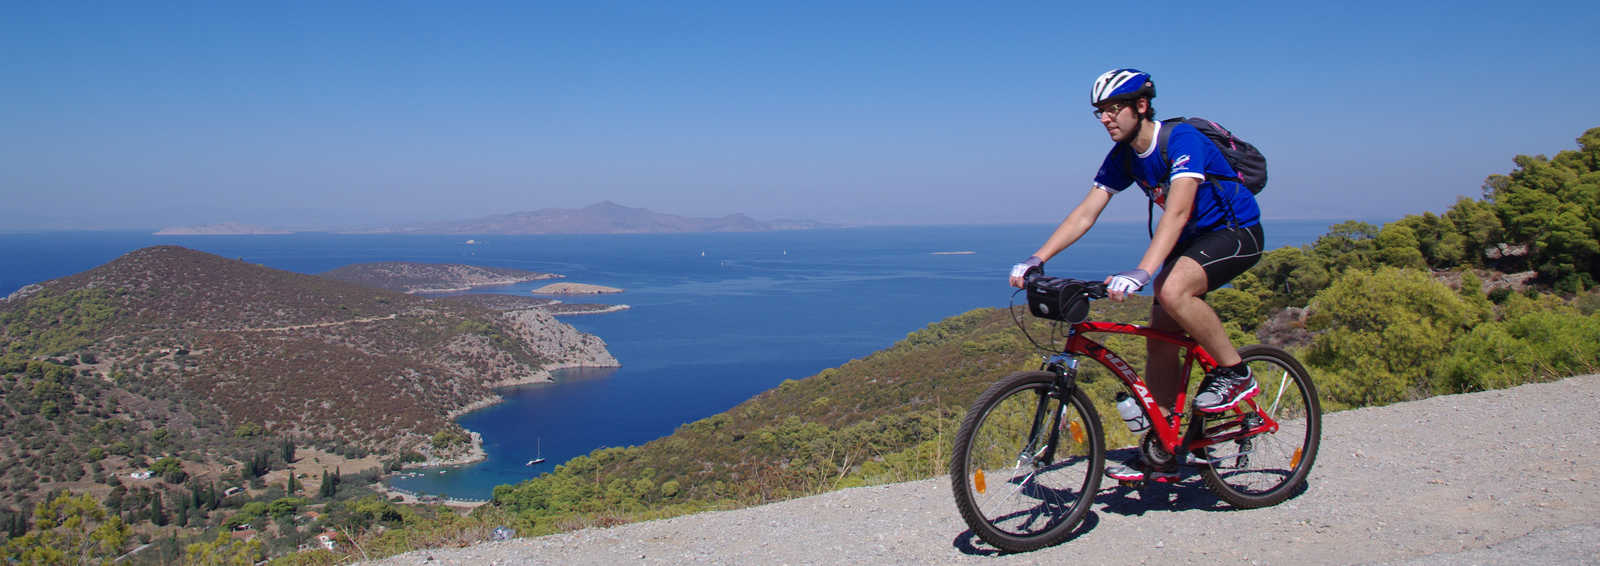 Cyclist on coastal road, Greece